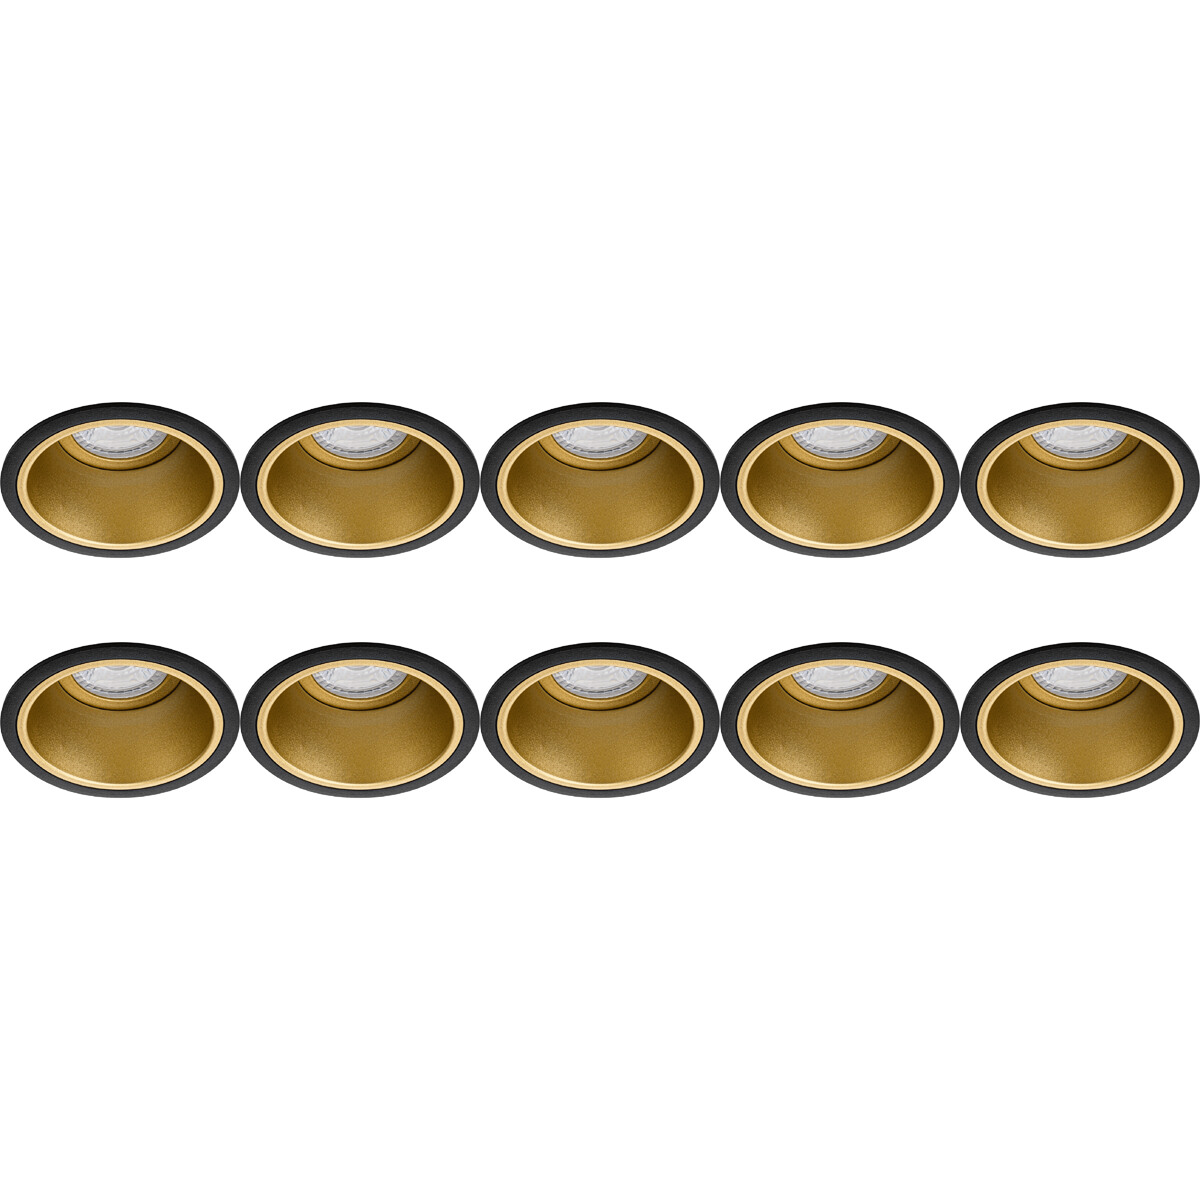 Spot Armatuur 10 Pack - Pragmi Minko Pro - GU10 Fitting - Inbouw Rond - Mat Zwart/Goud - Aluminium -